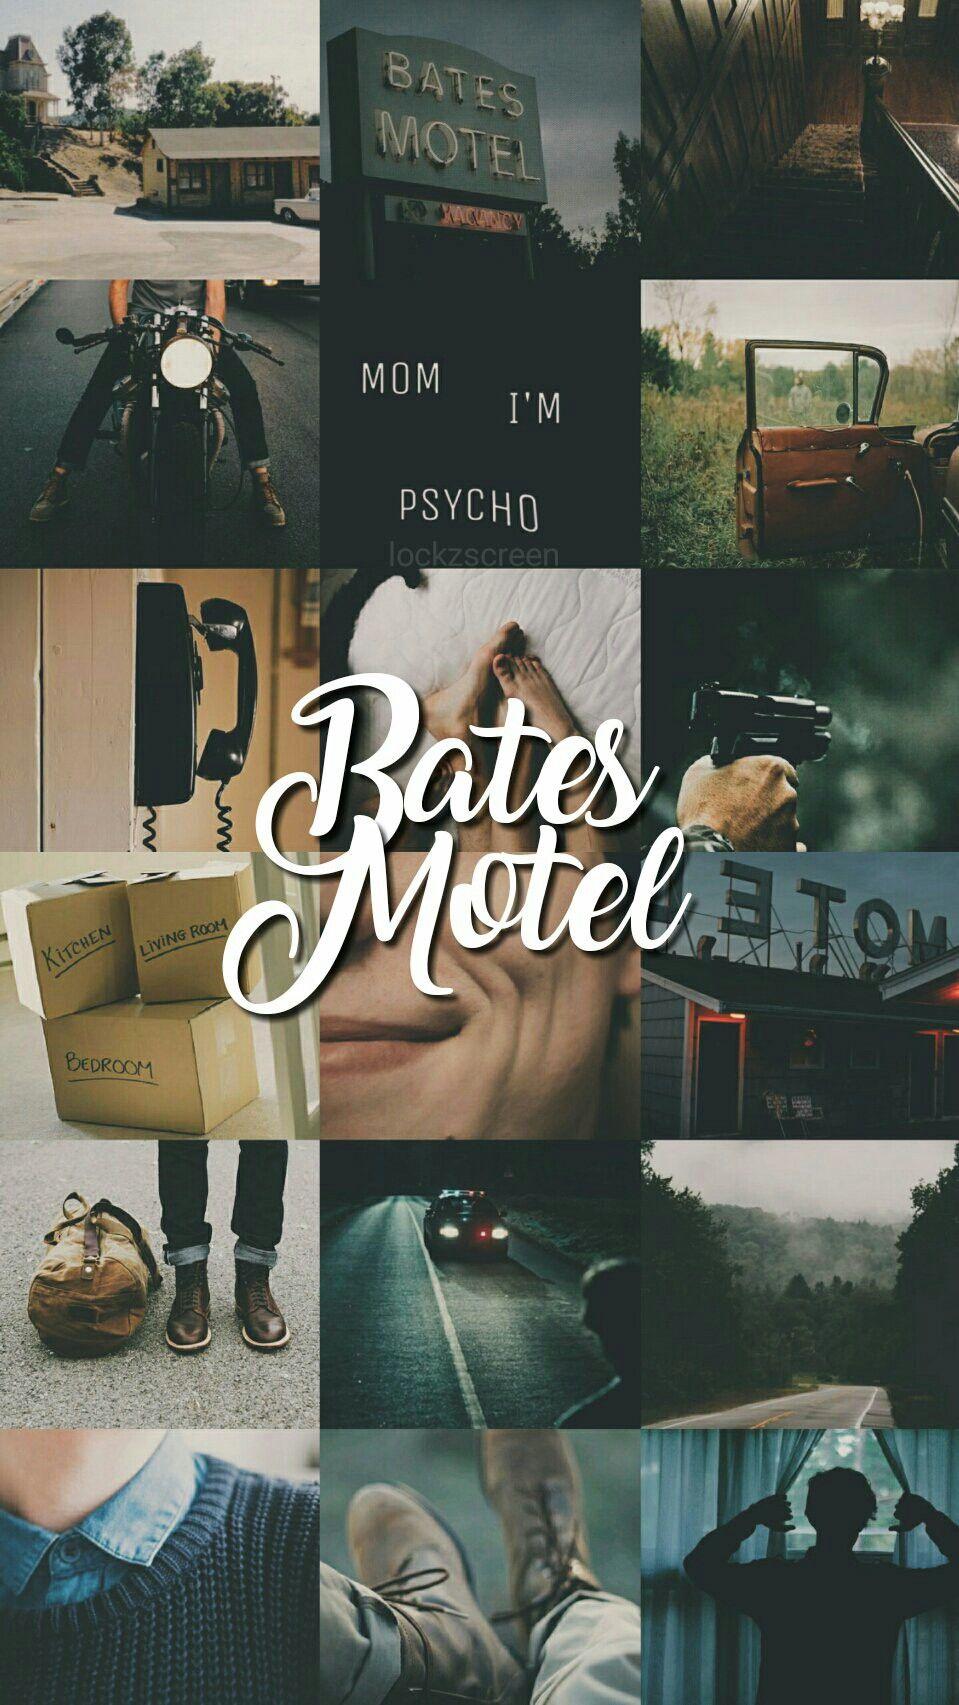 Wallpaper Bates motel